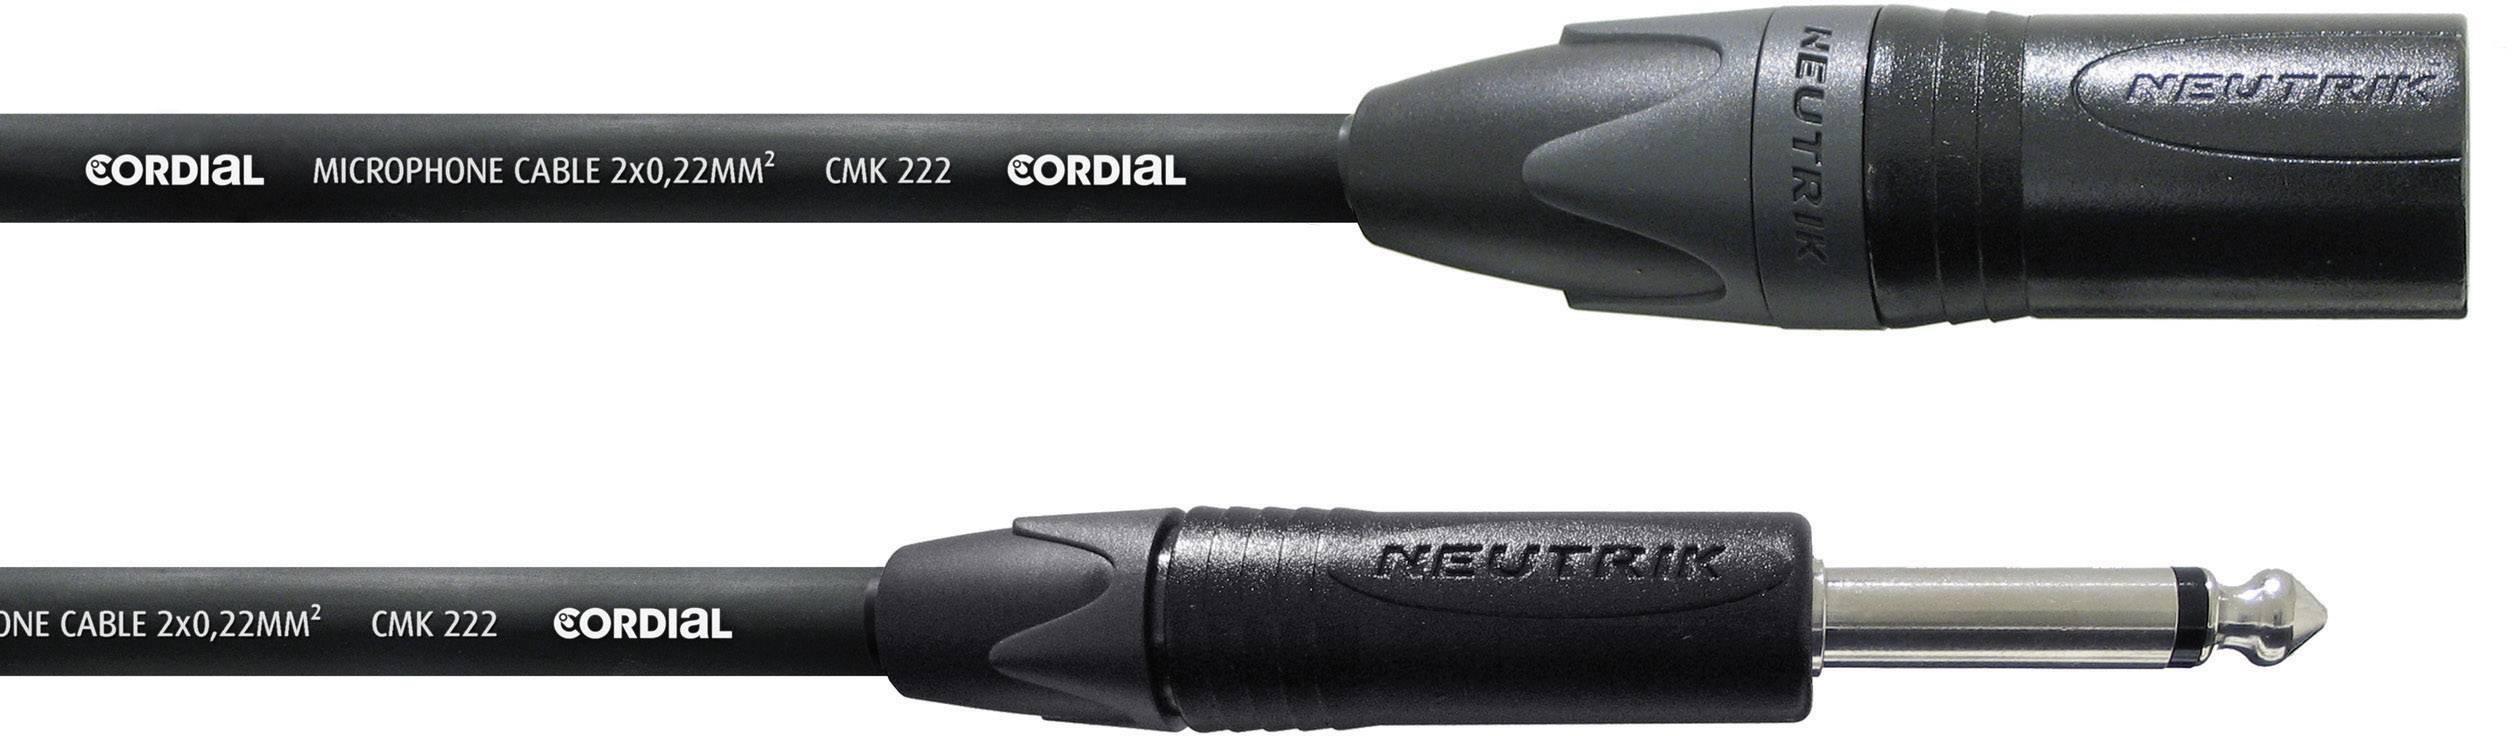 Mikrofónny XLR káblový adaptér Cordial CPM 10 MP CPM 10 MP, 10 m, čierna